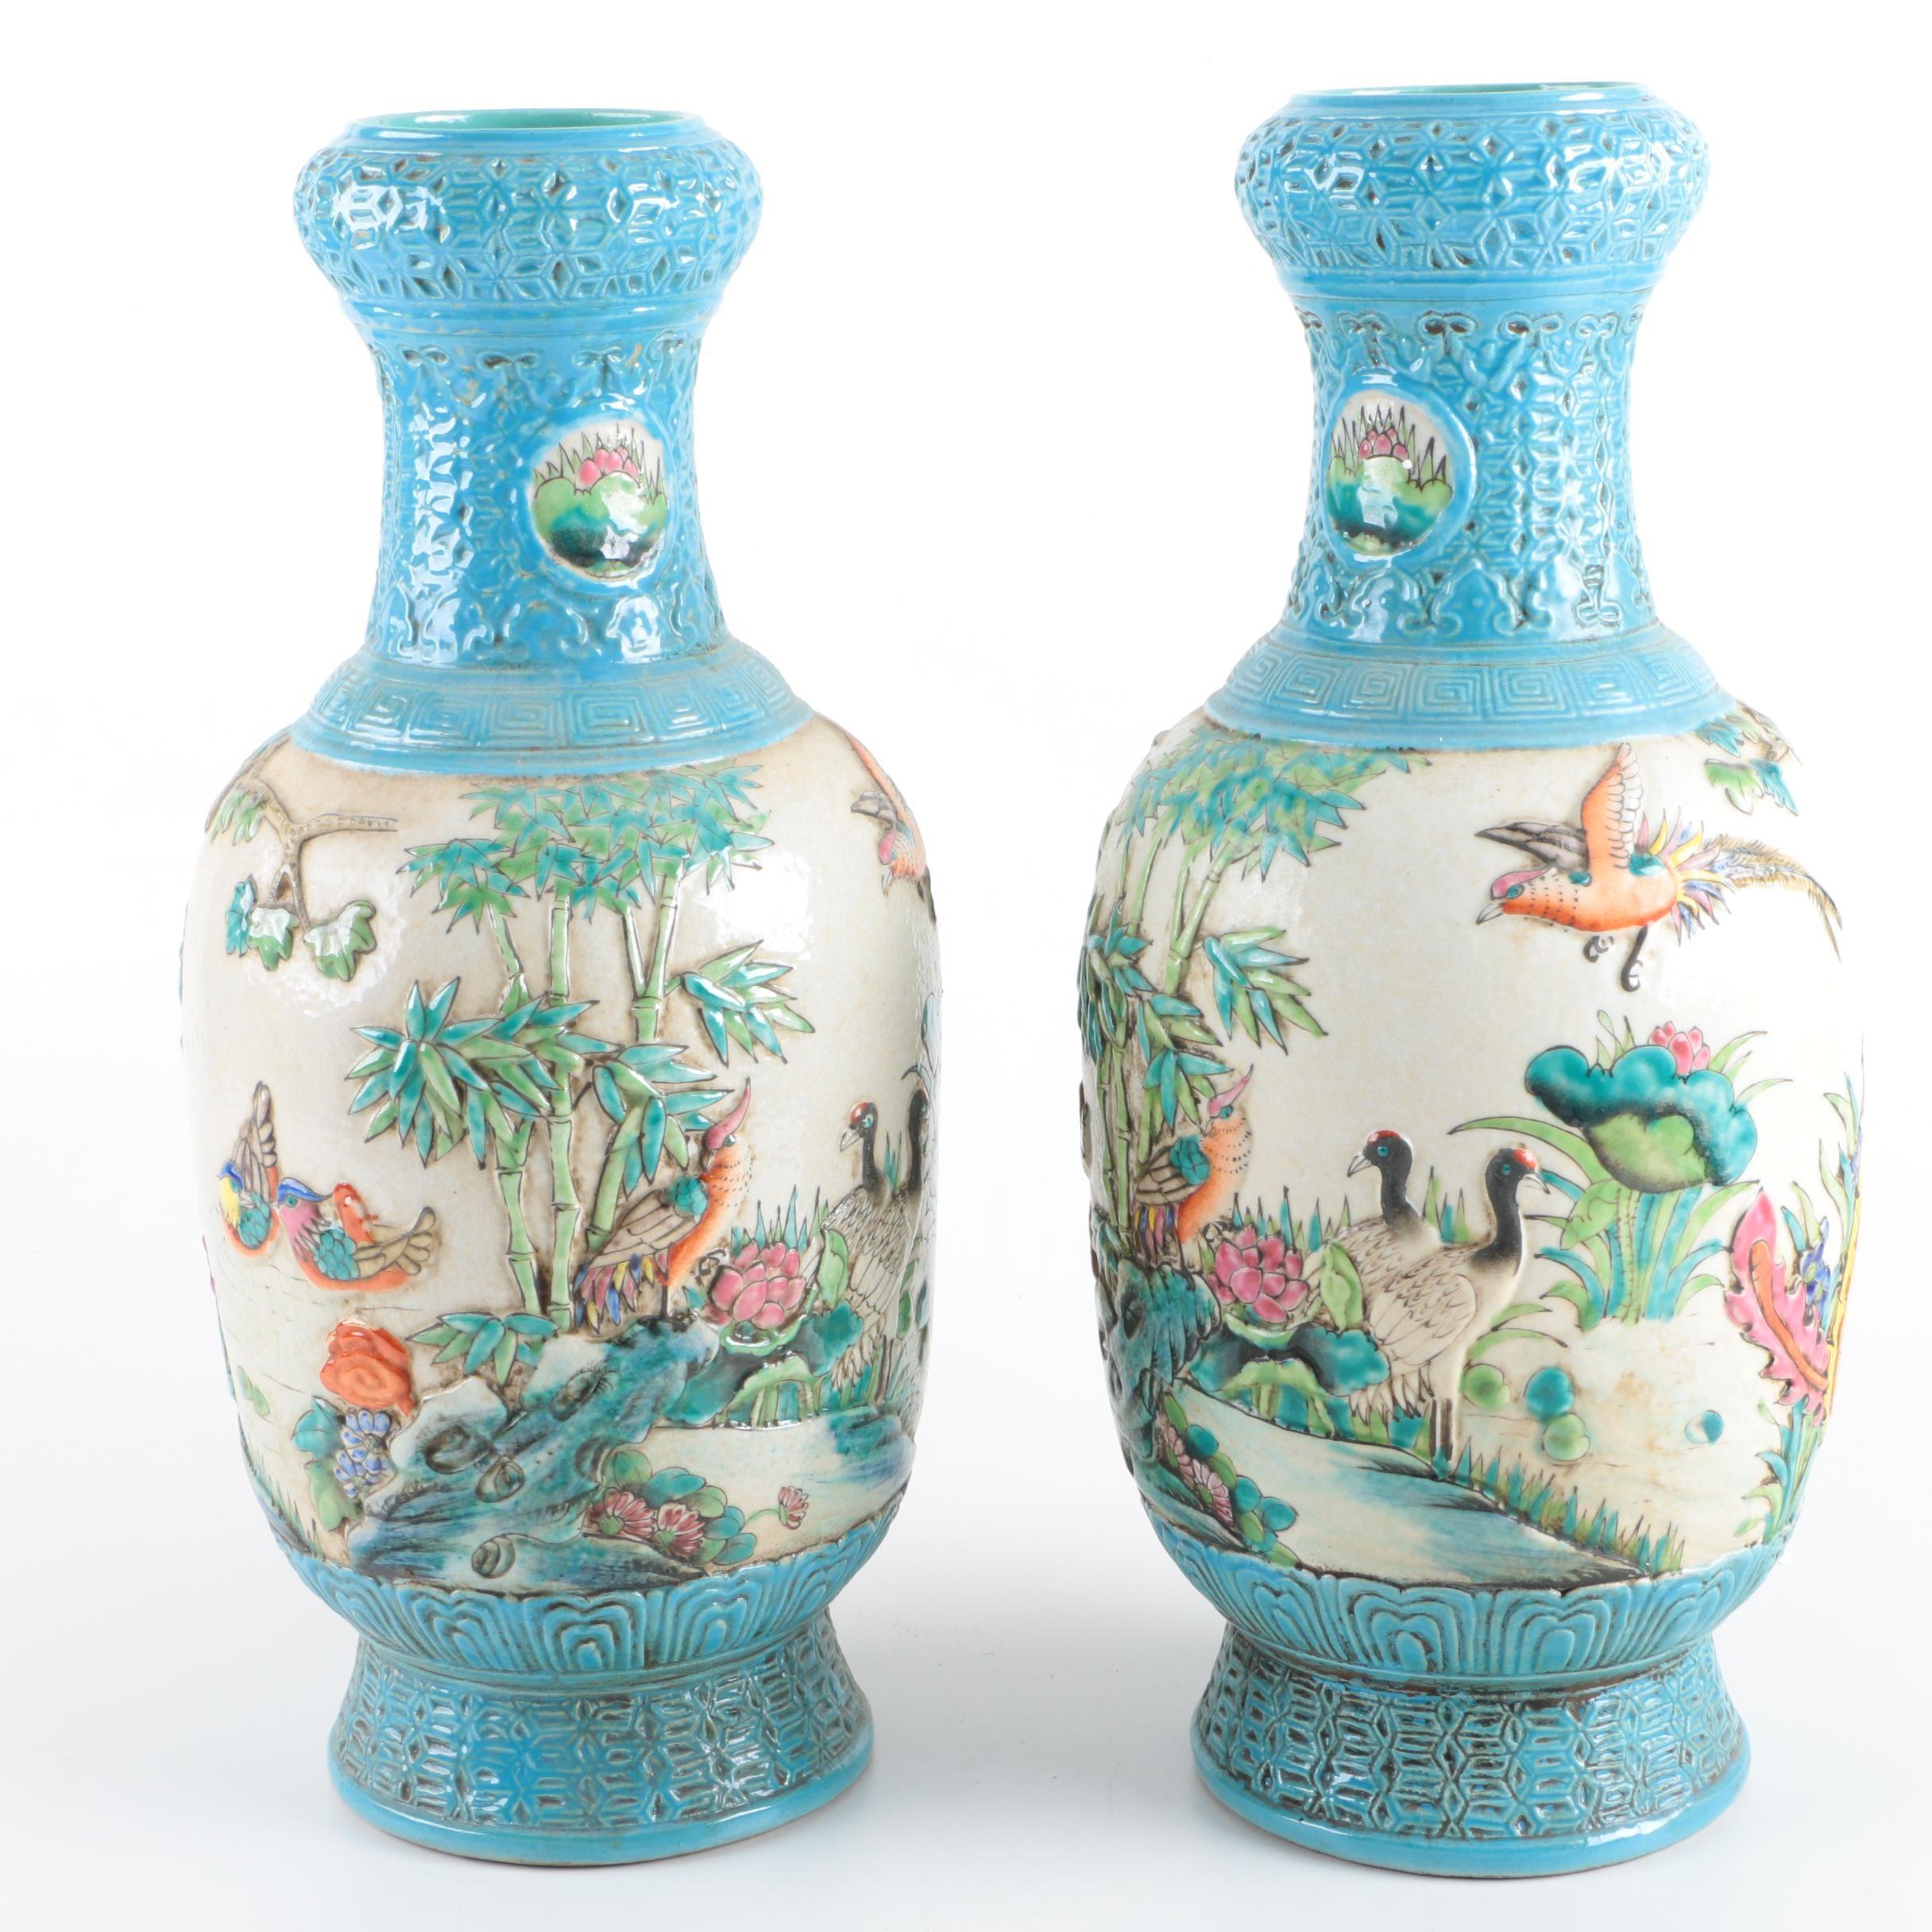 Chinese Embossed Ceramic Vases